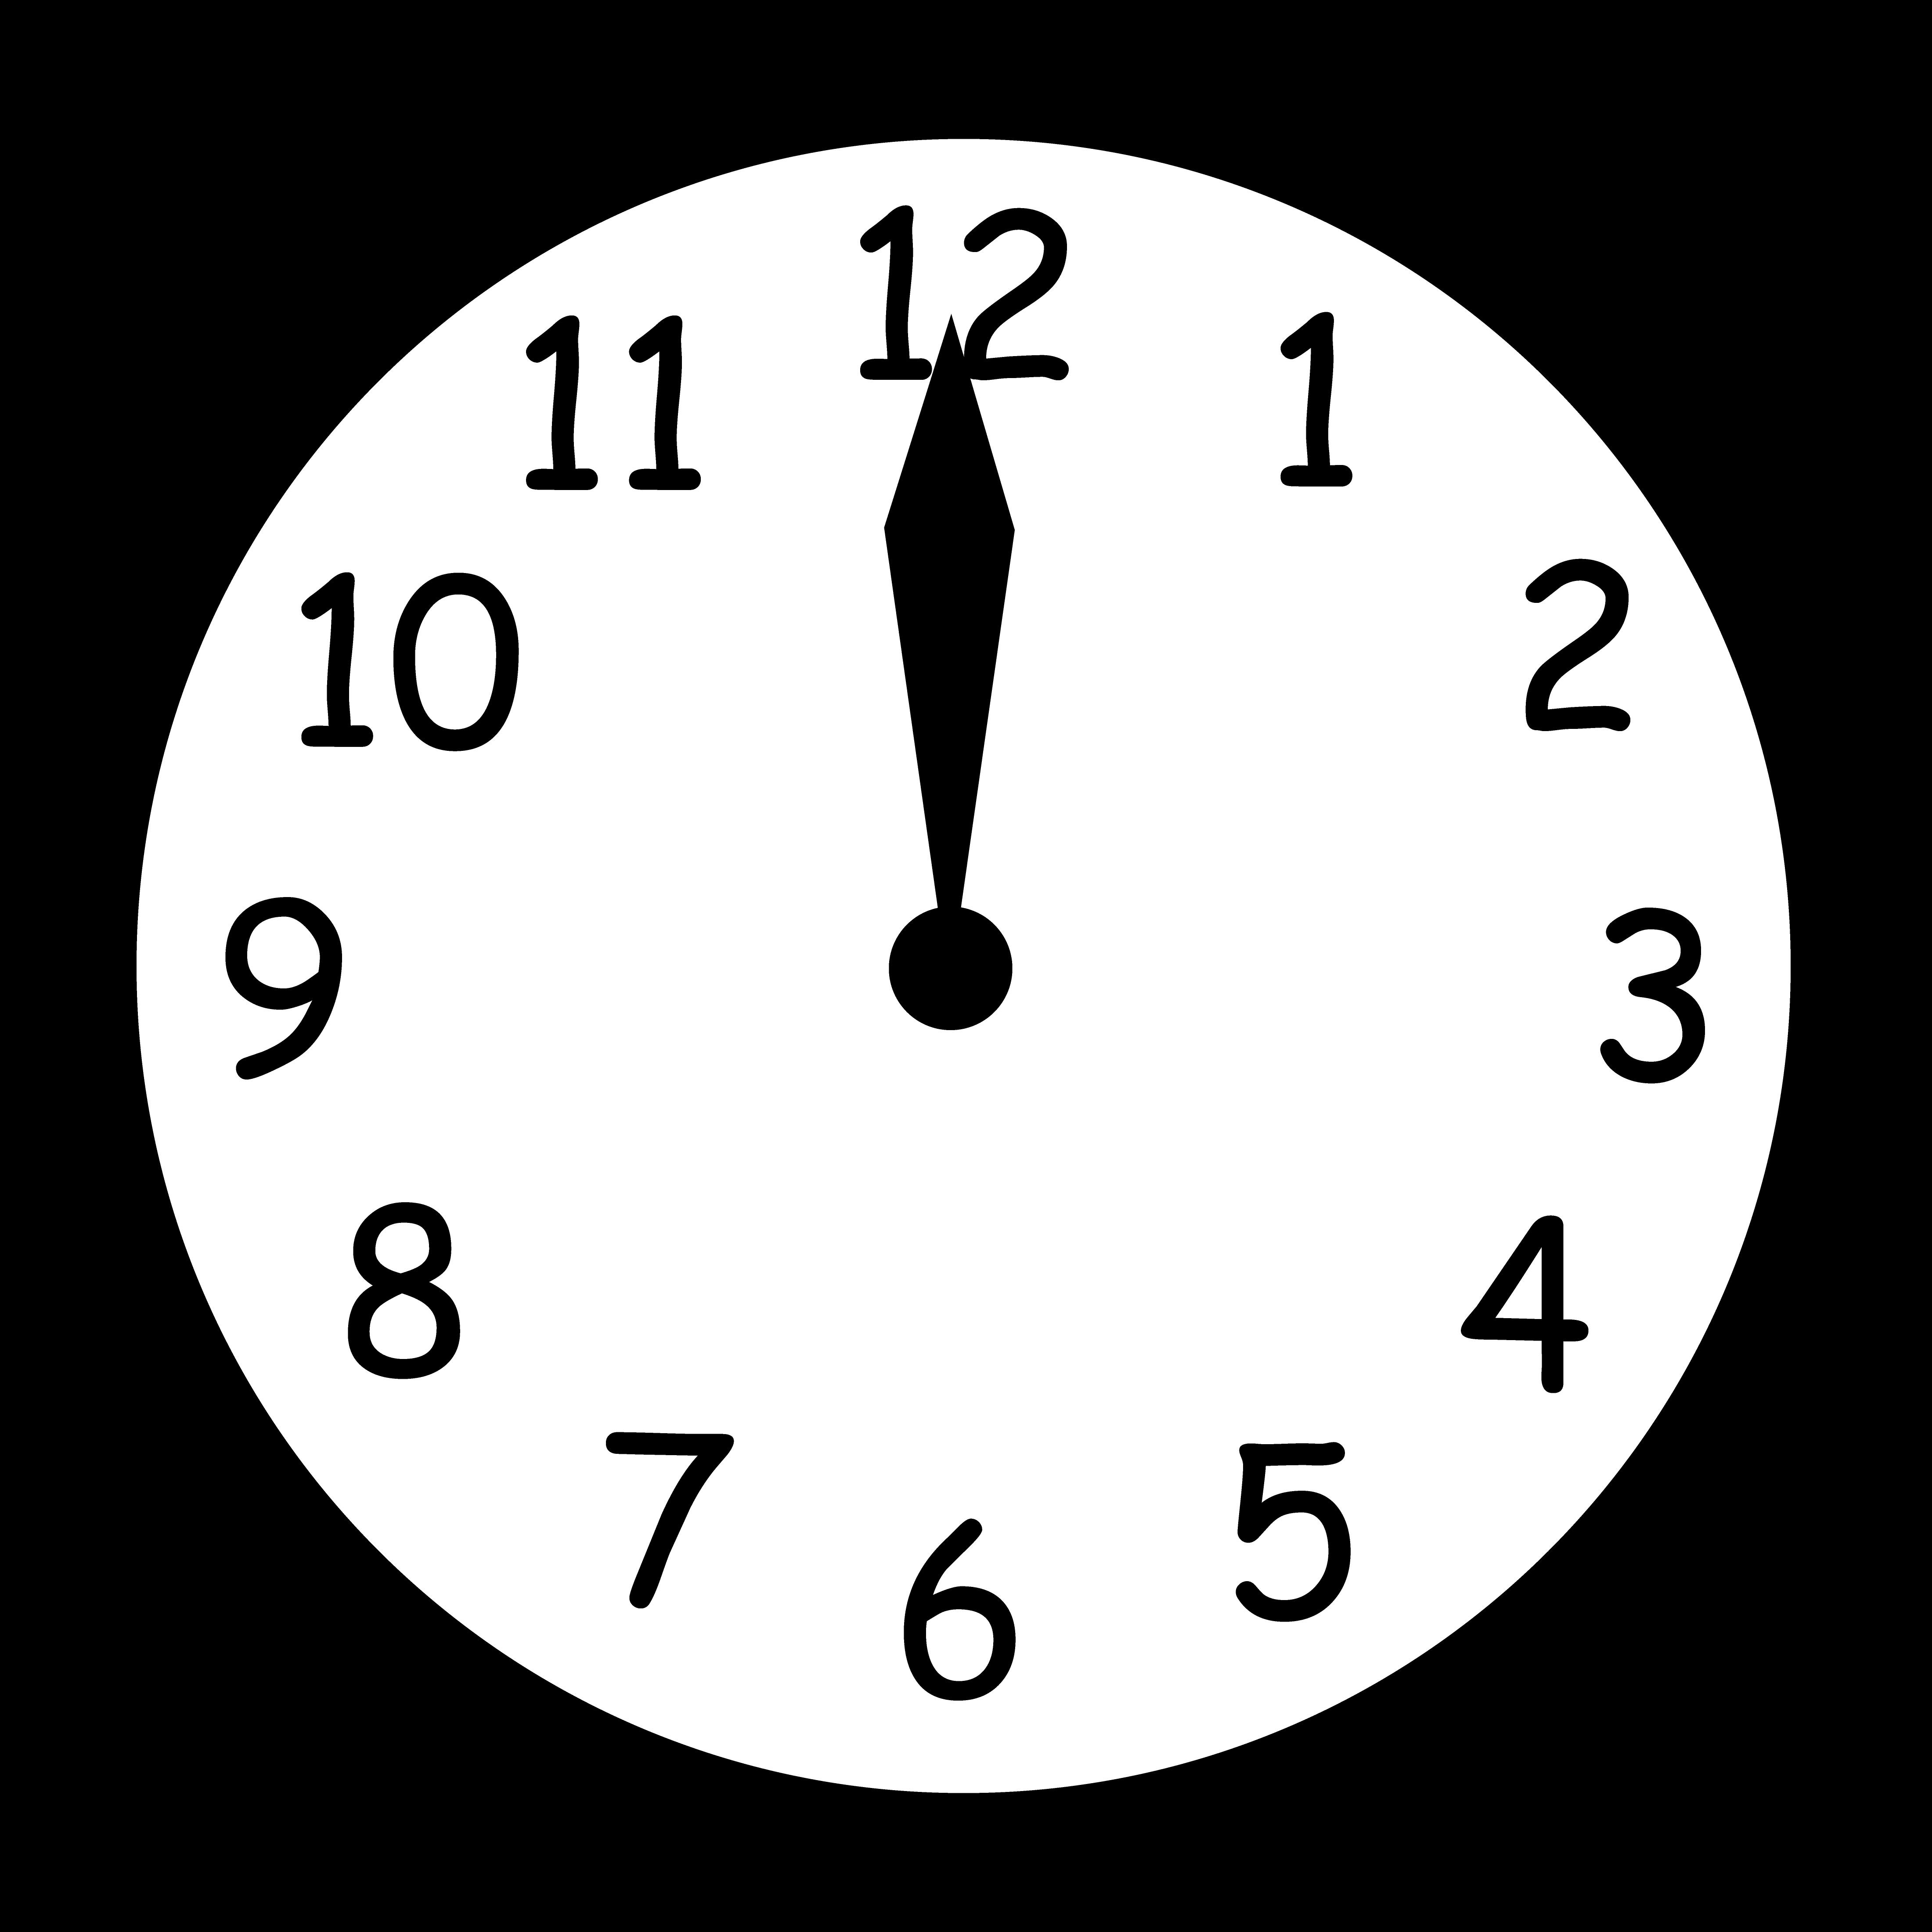 Clock 7 o clock clipart black and white jpg free stock Wall Clock Striking Twelve - Free Clip Art jpg free stock